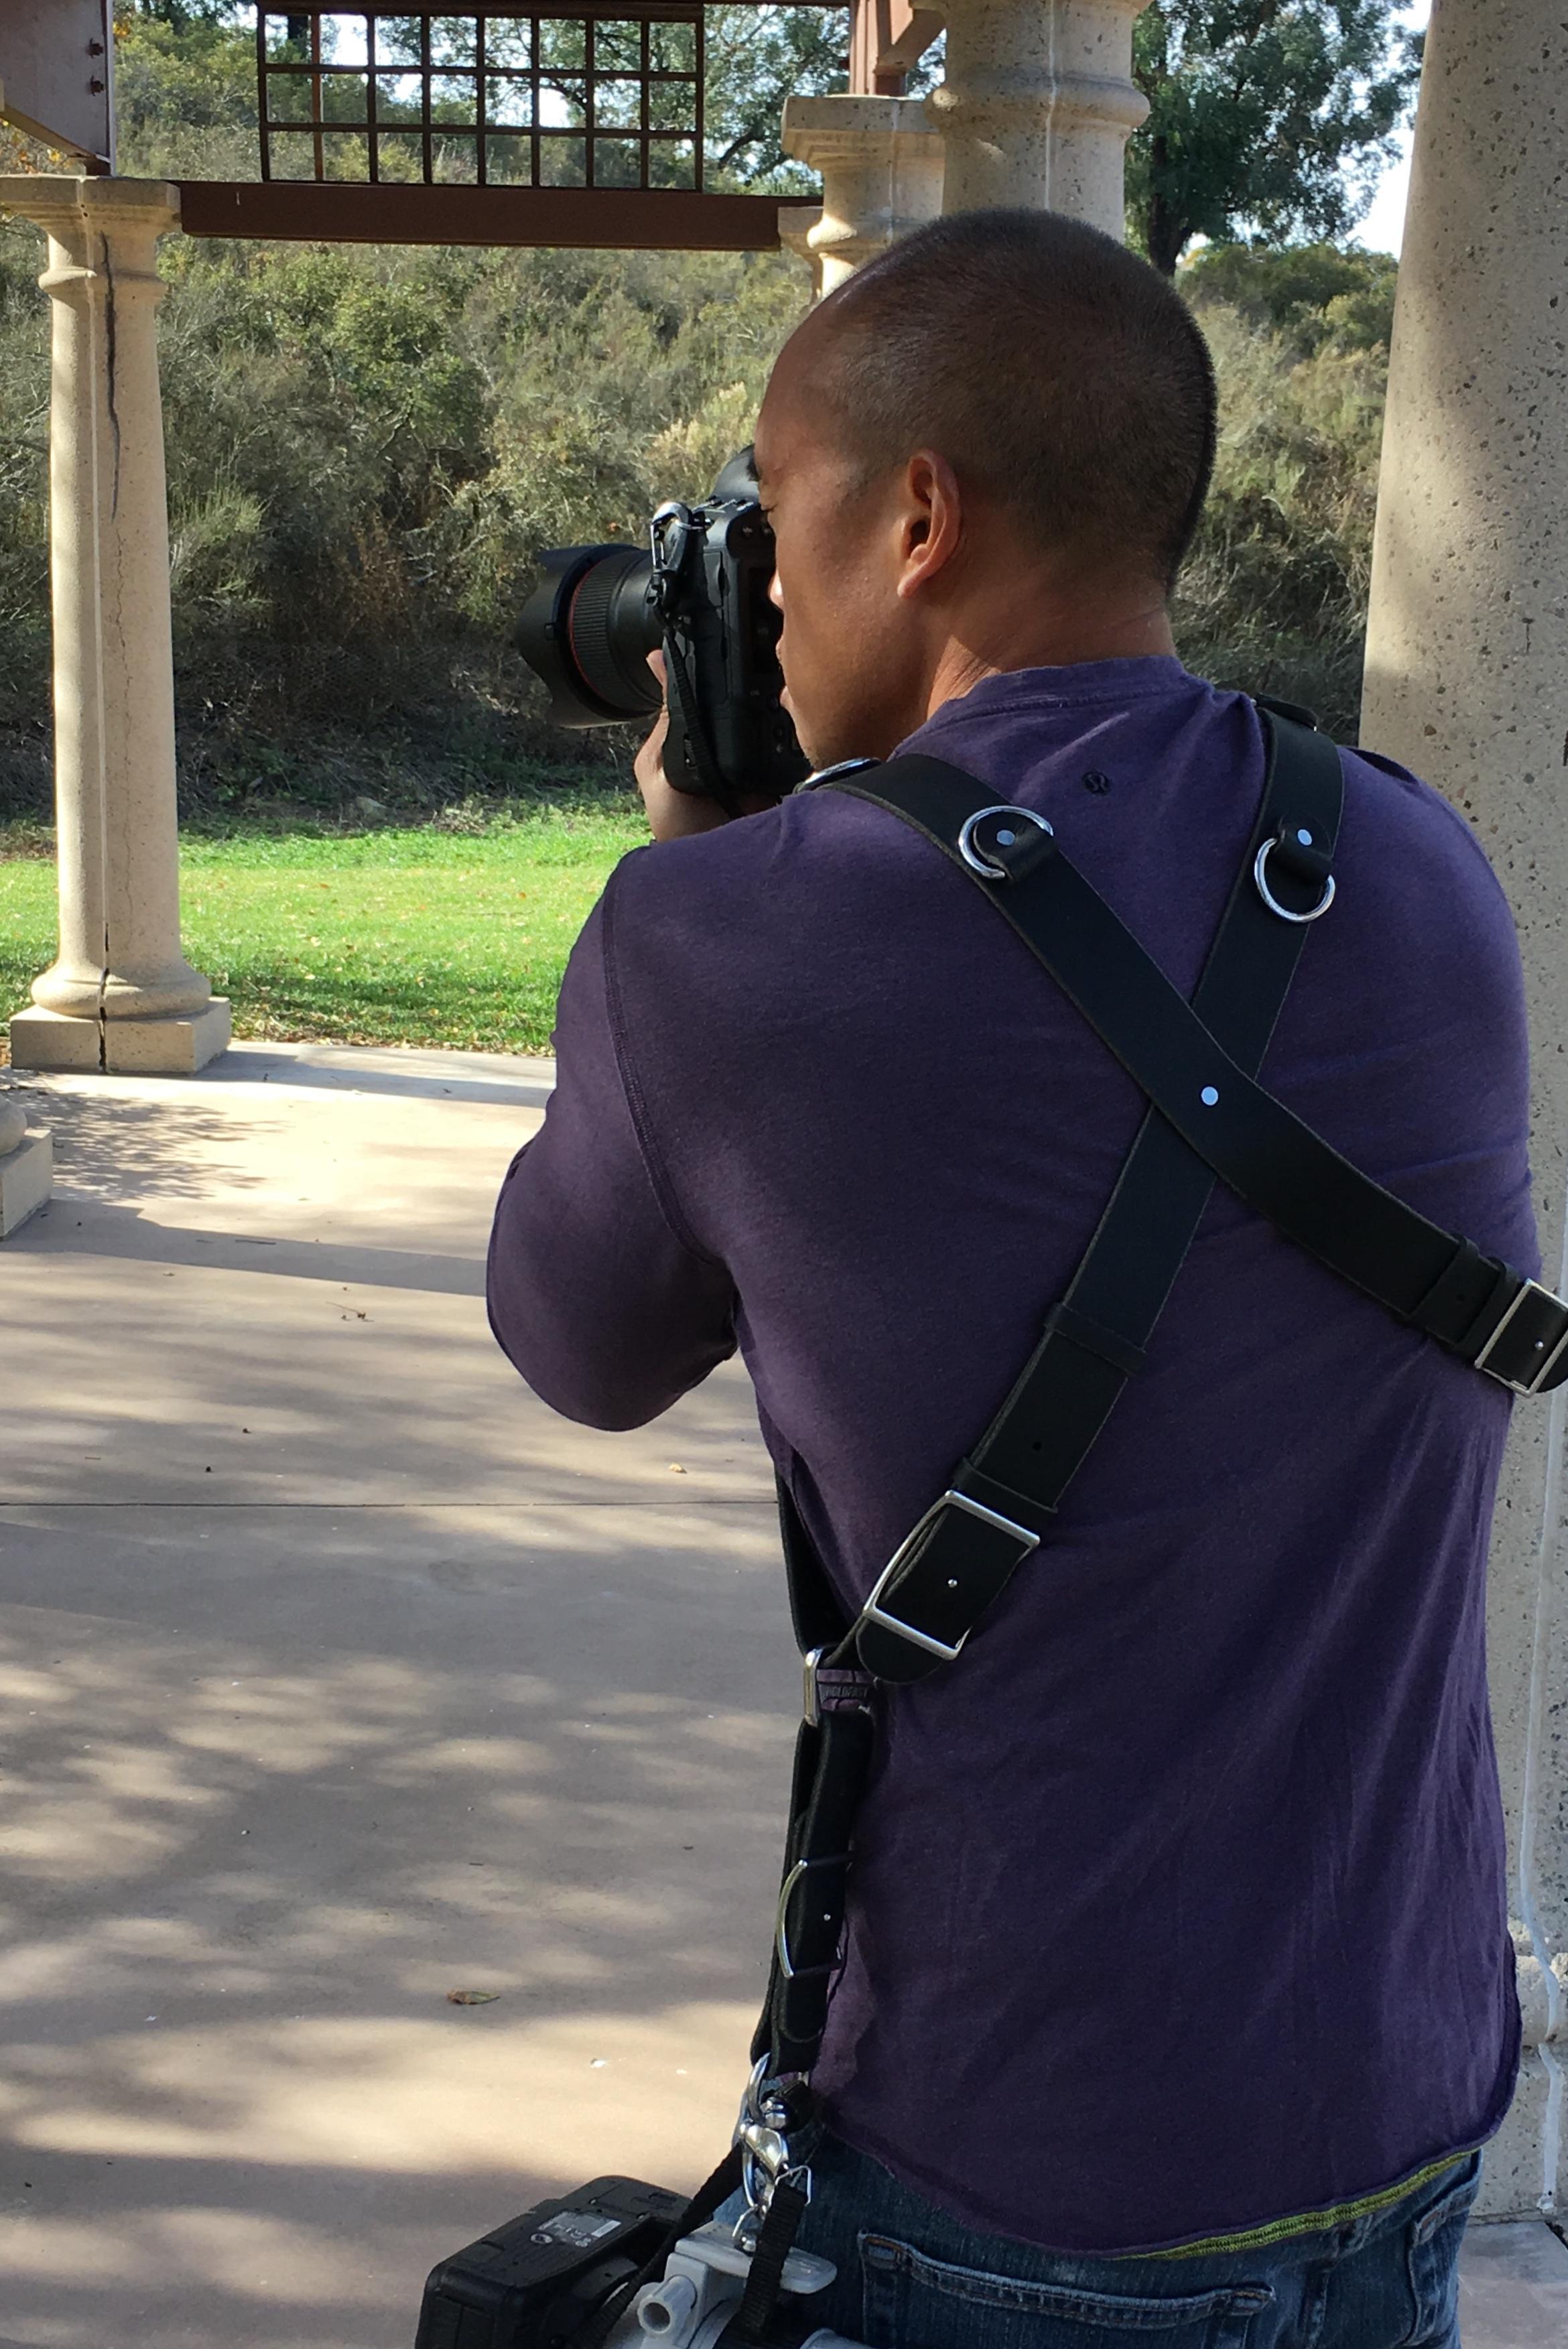 Image for Anthony Eusebio's Story